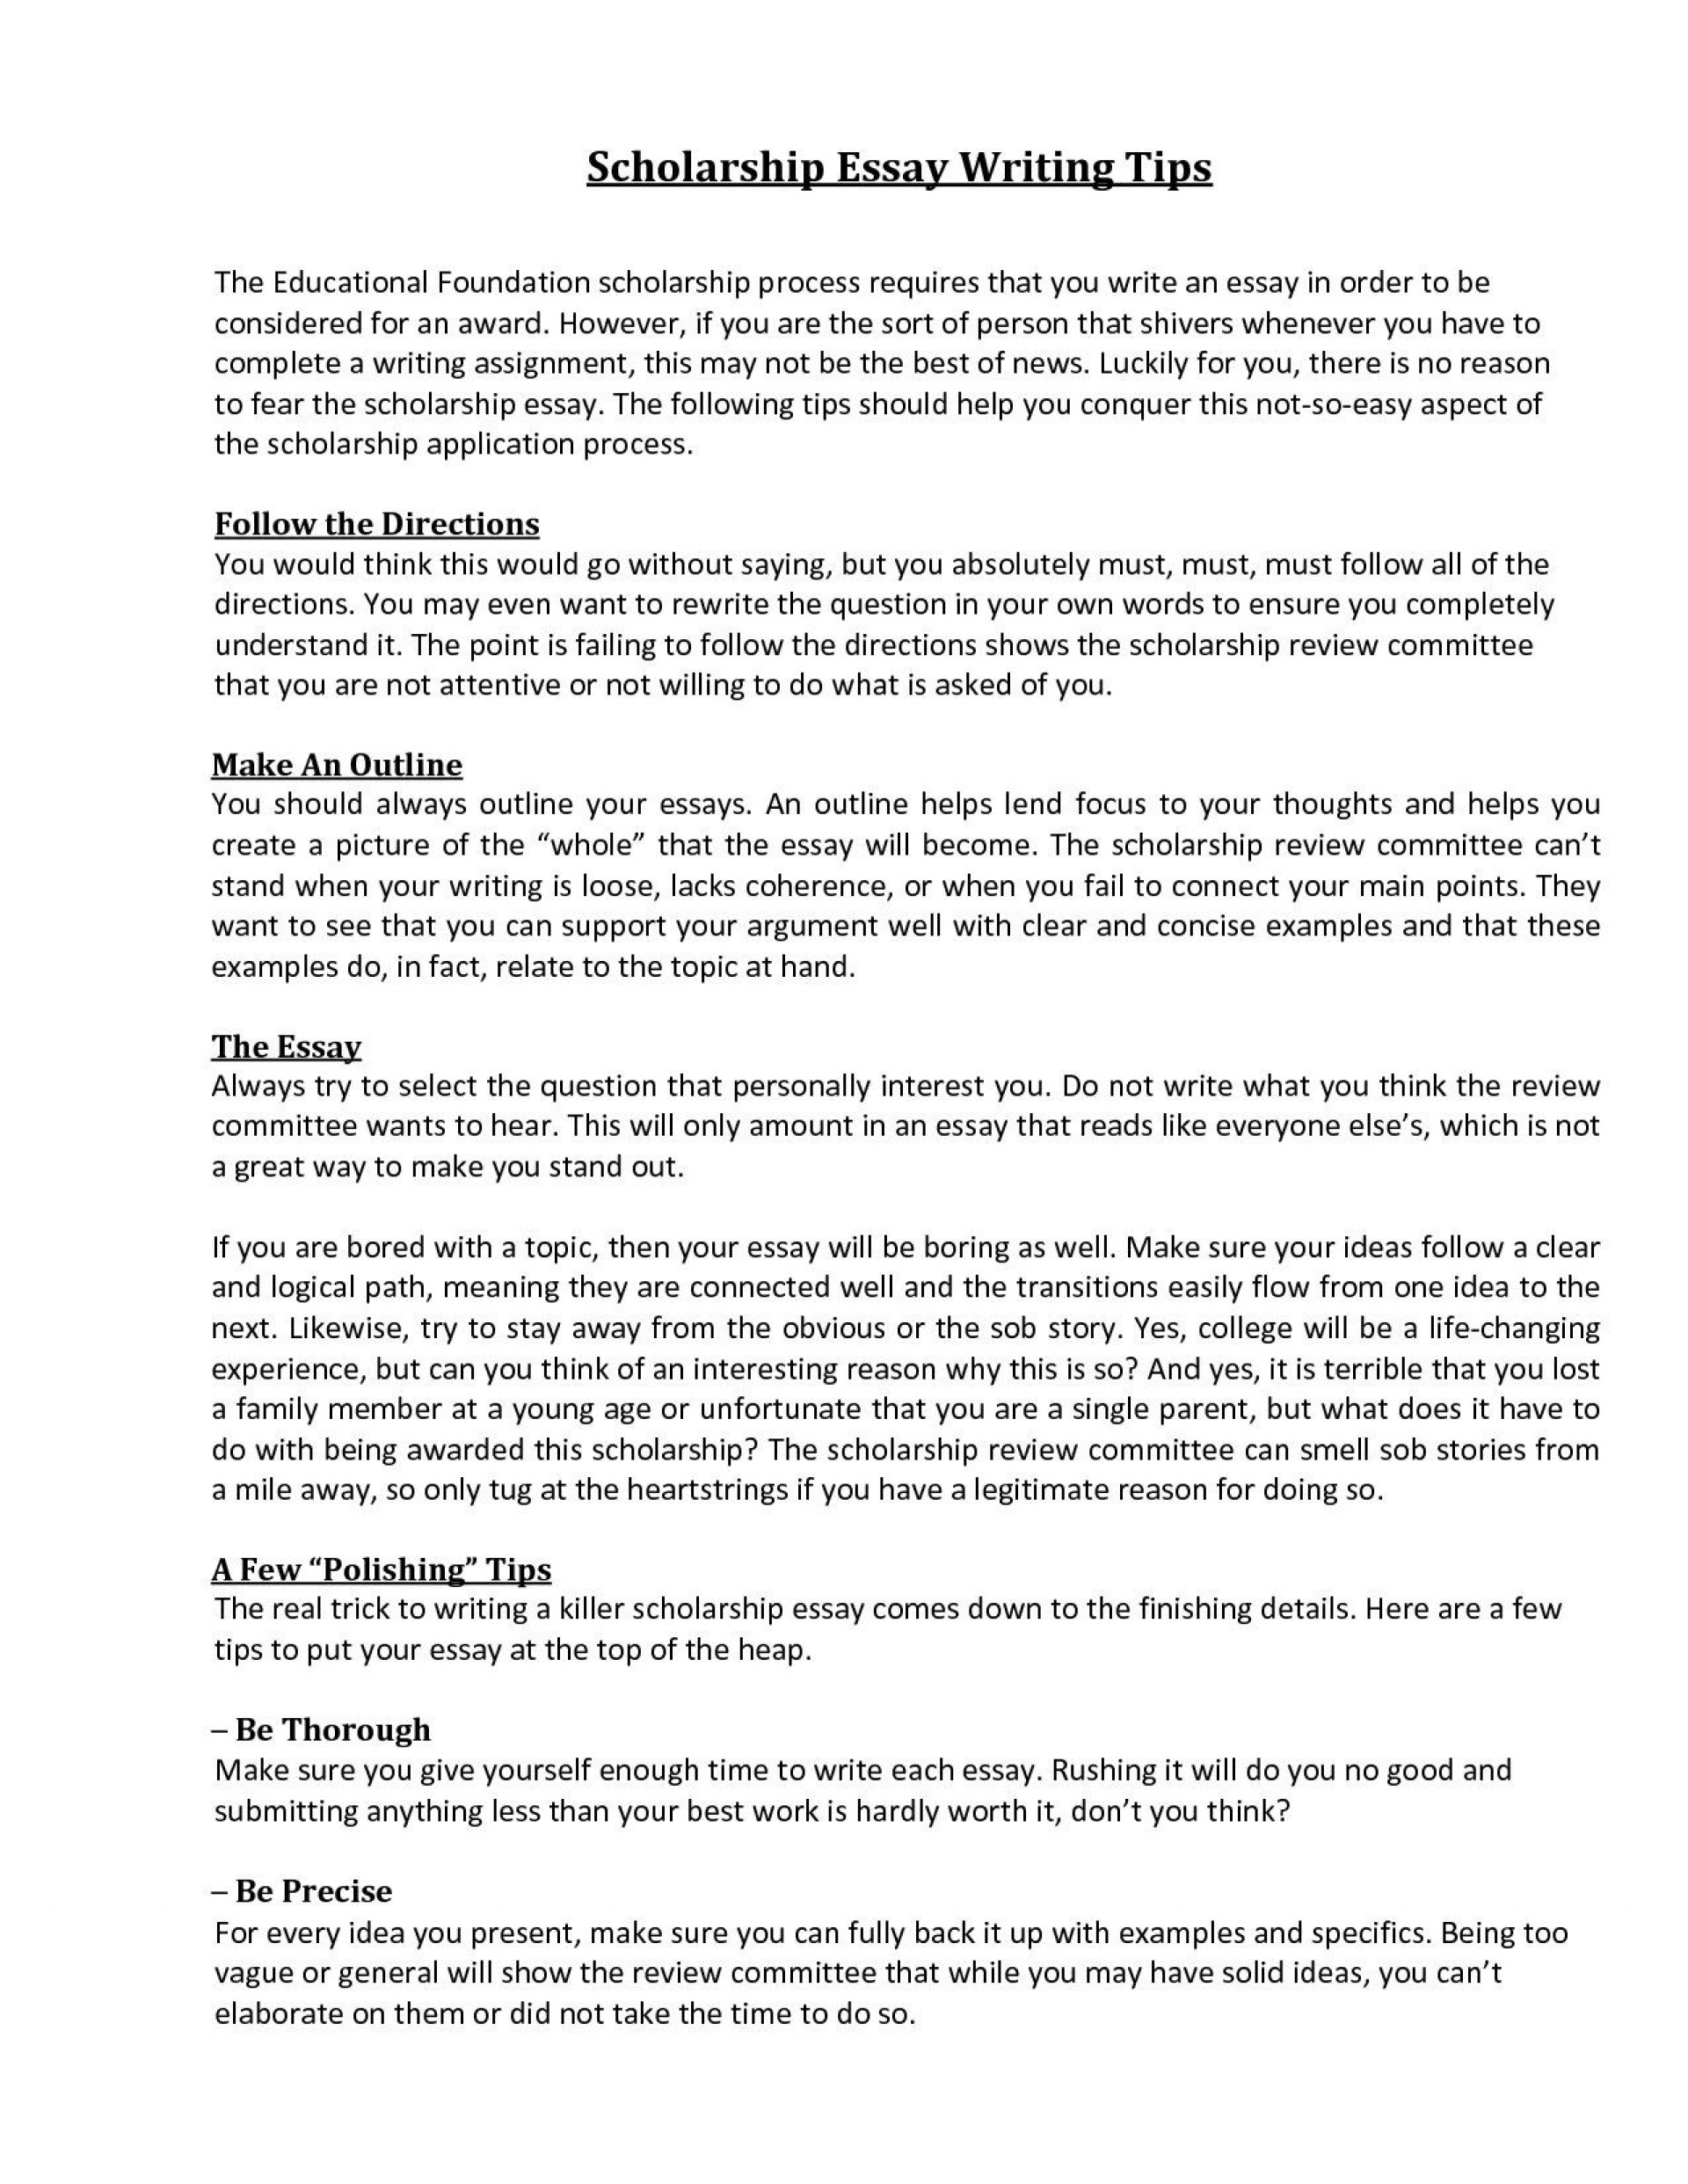 Pet rescue saga fase 476 traffic report